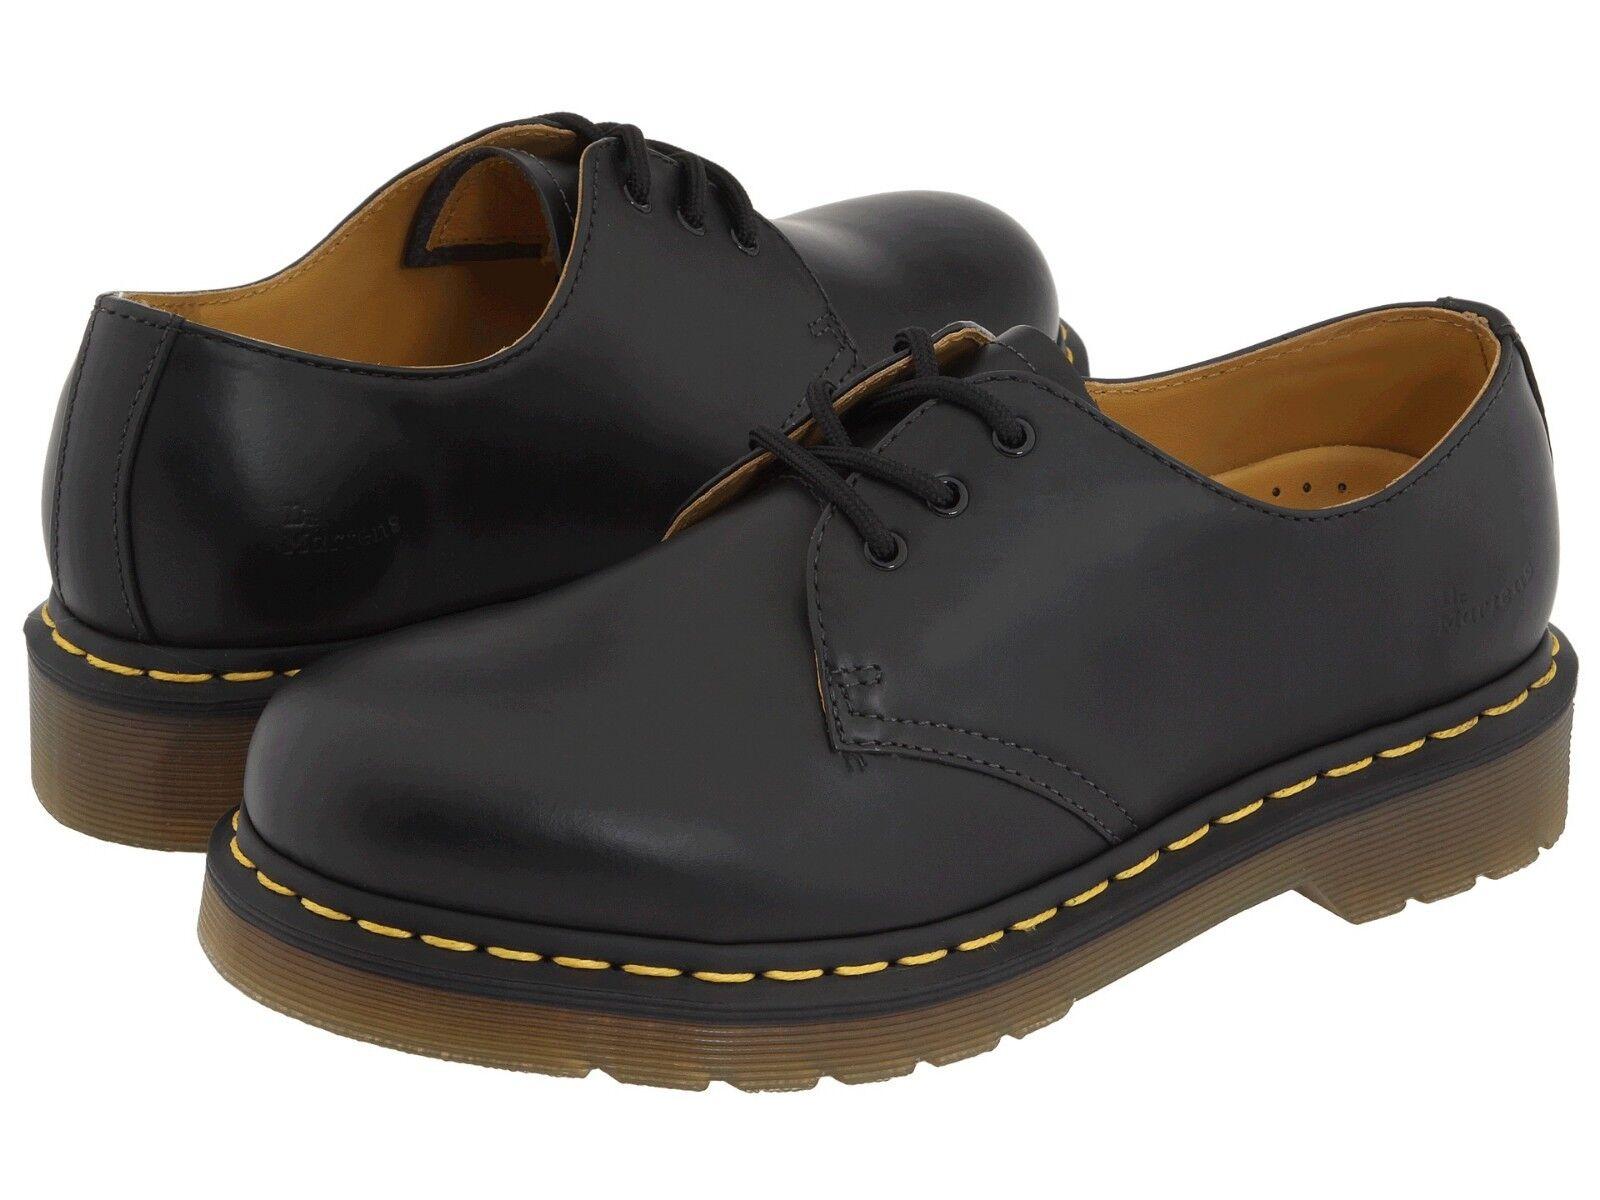 wolverine chukka shoes